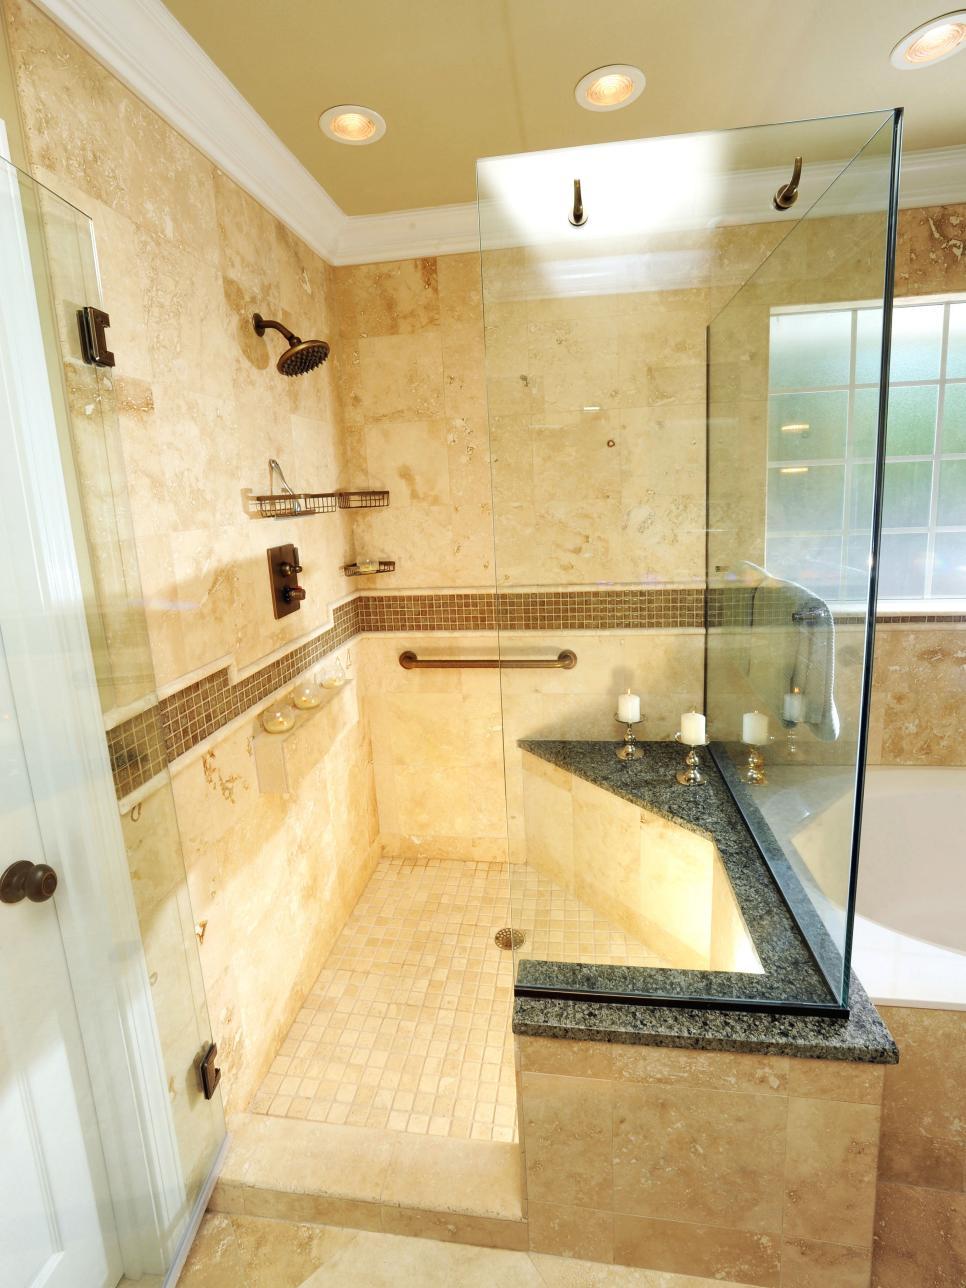 Bathroom Remodel Ideas To Inspire You: Bathroom Shower Designs